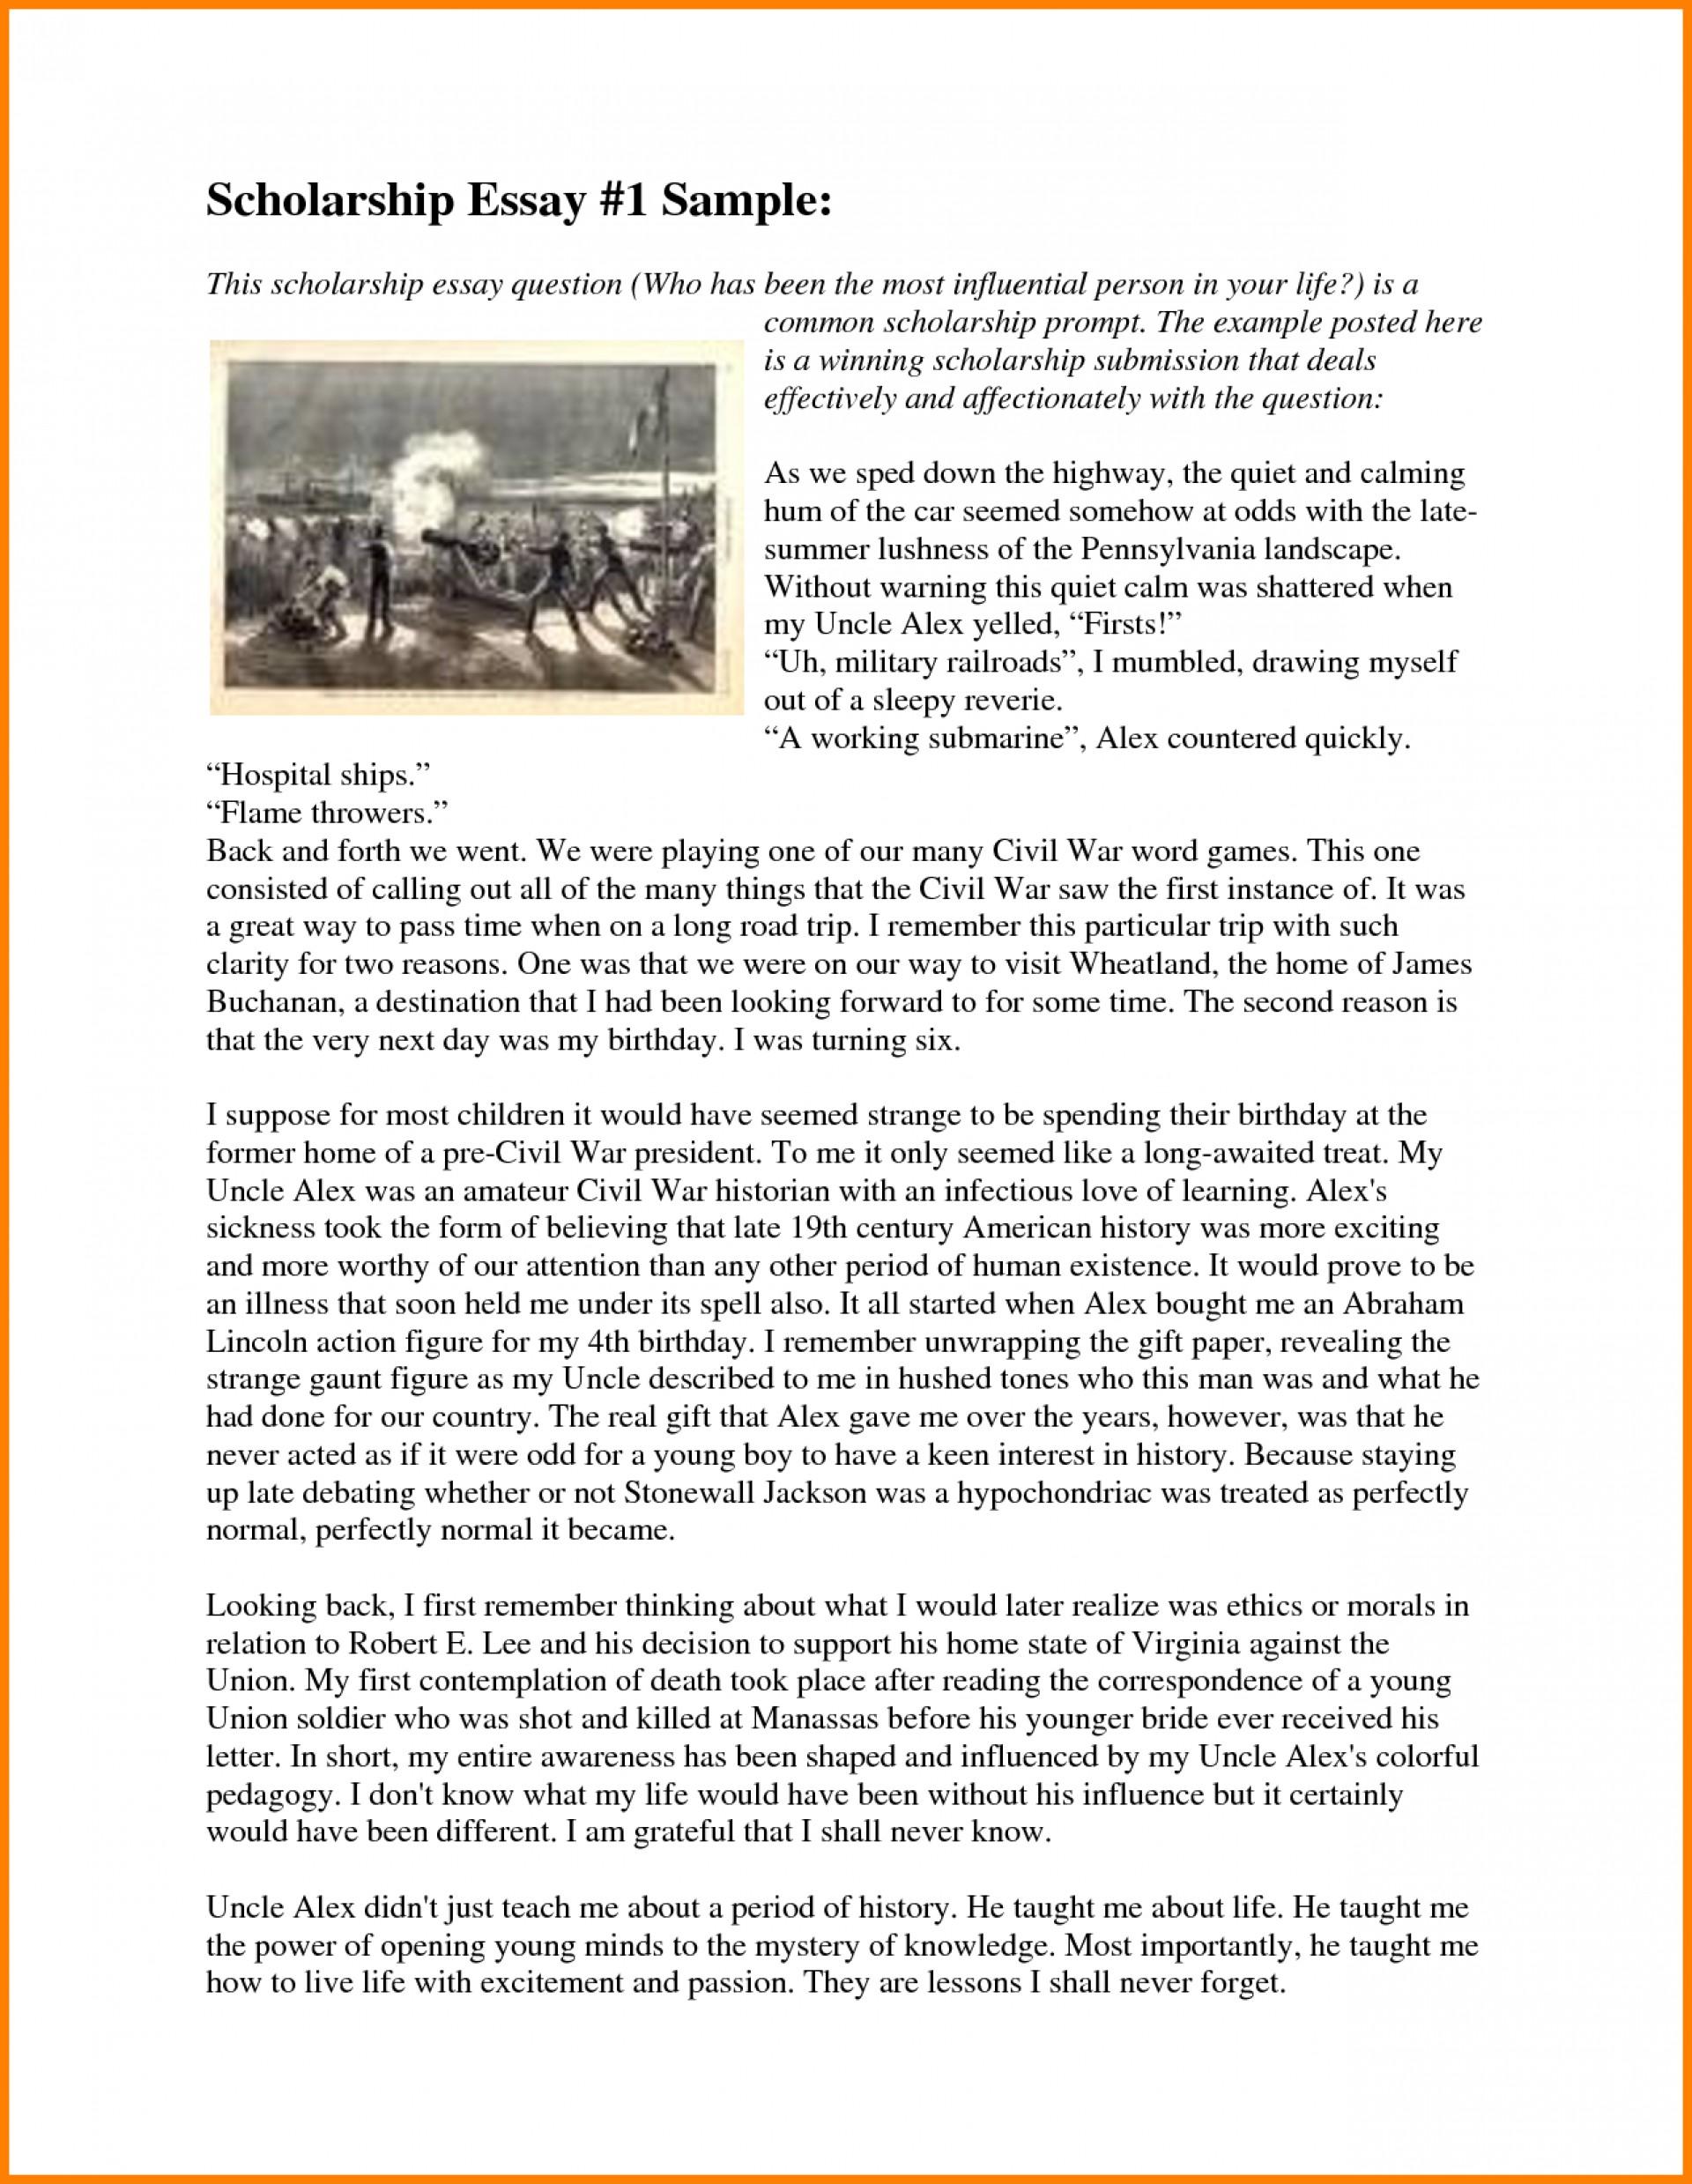 006 Essay Example Winning Scholarship Examples College Fix Ablez Exa Nursing Award Stupendous Pdf 1920